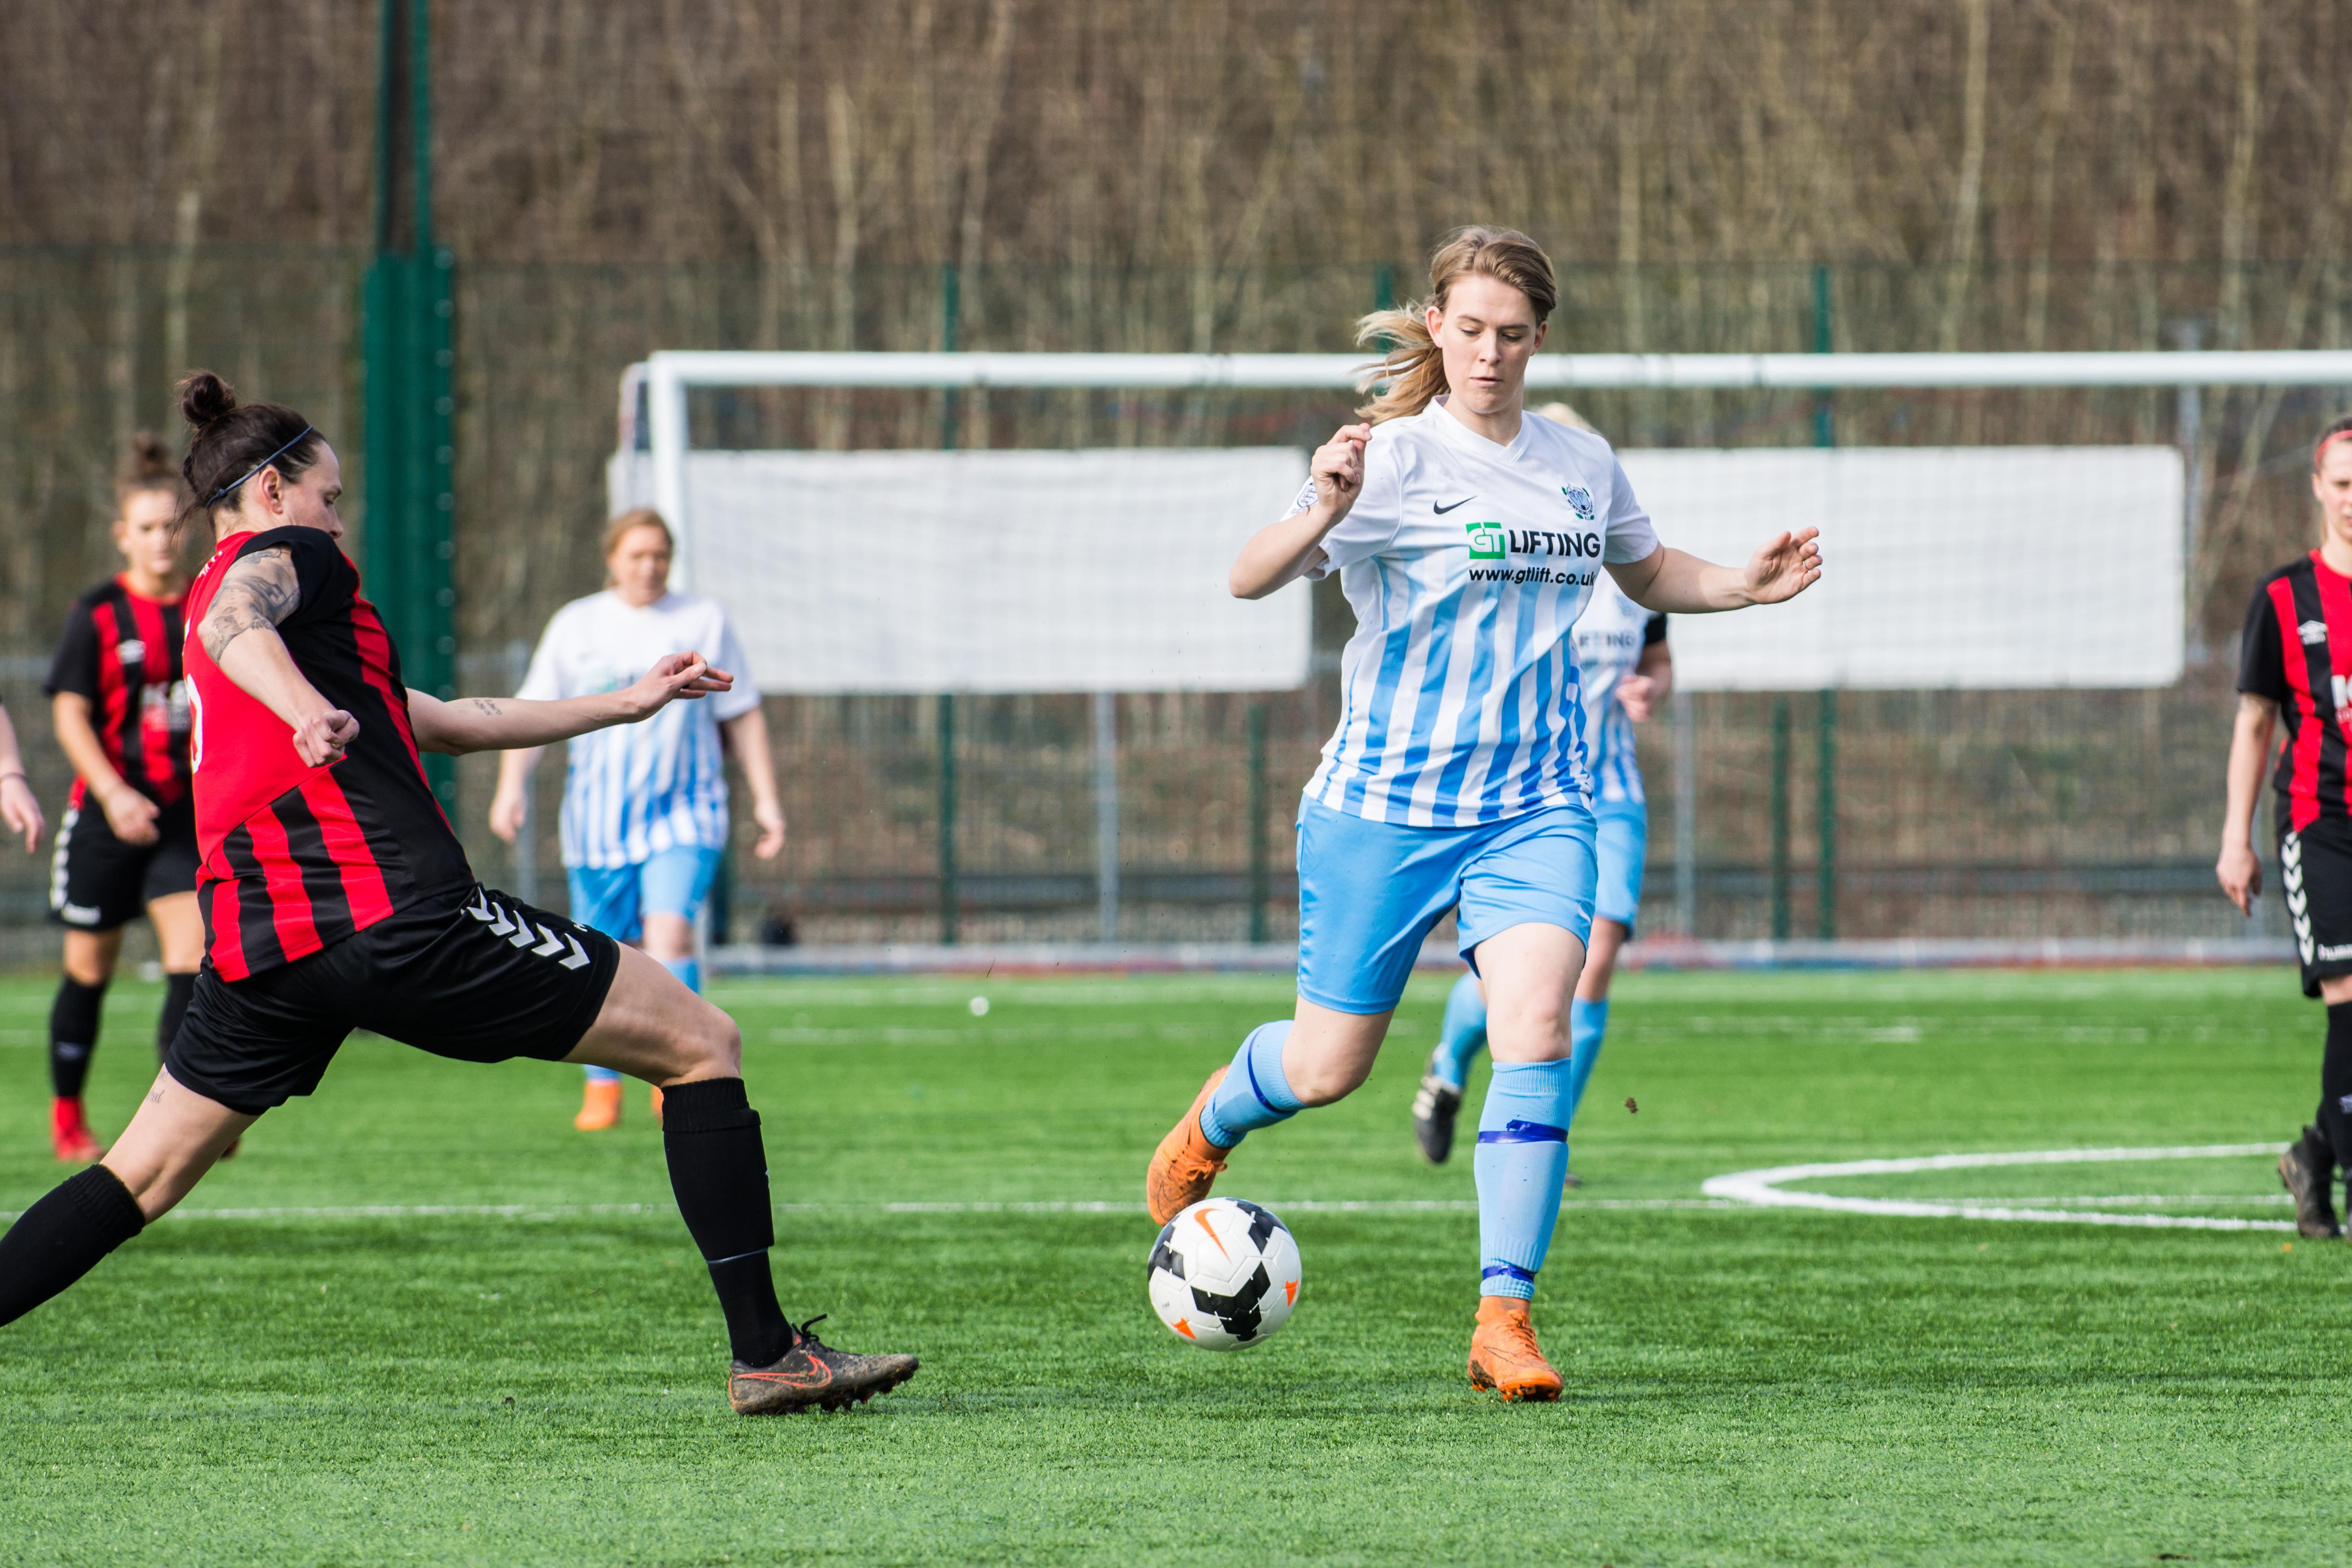 DAVID_JEFFERY Saltdean Utd Ladies FC vs Worthing Utd Ladies FC 11.03.18 04